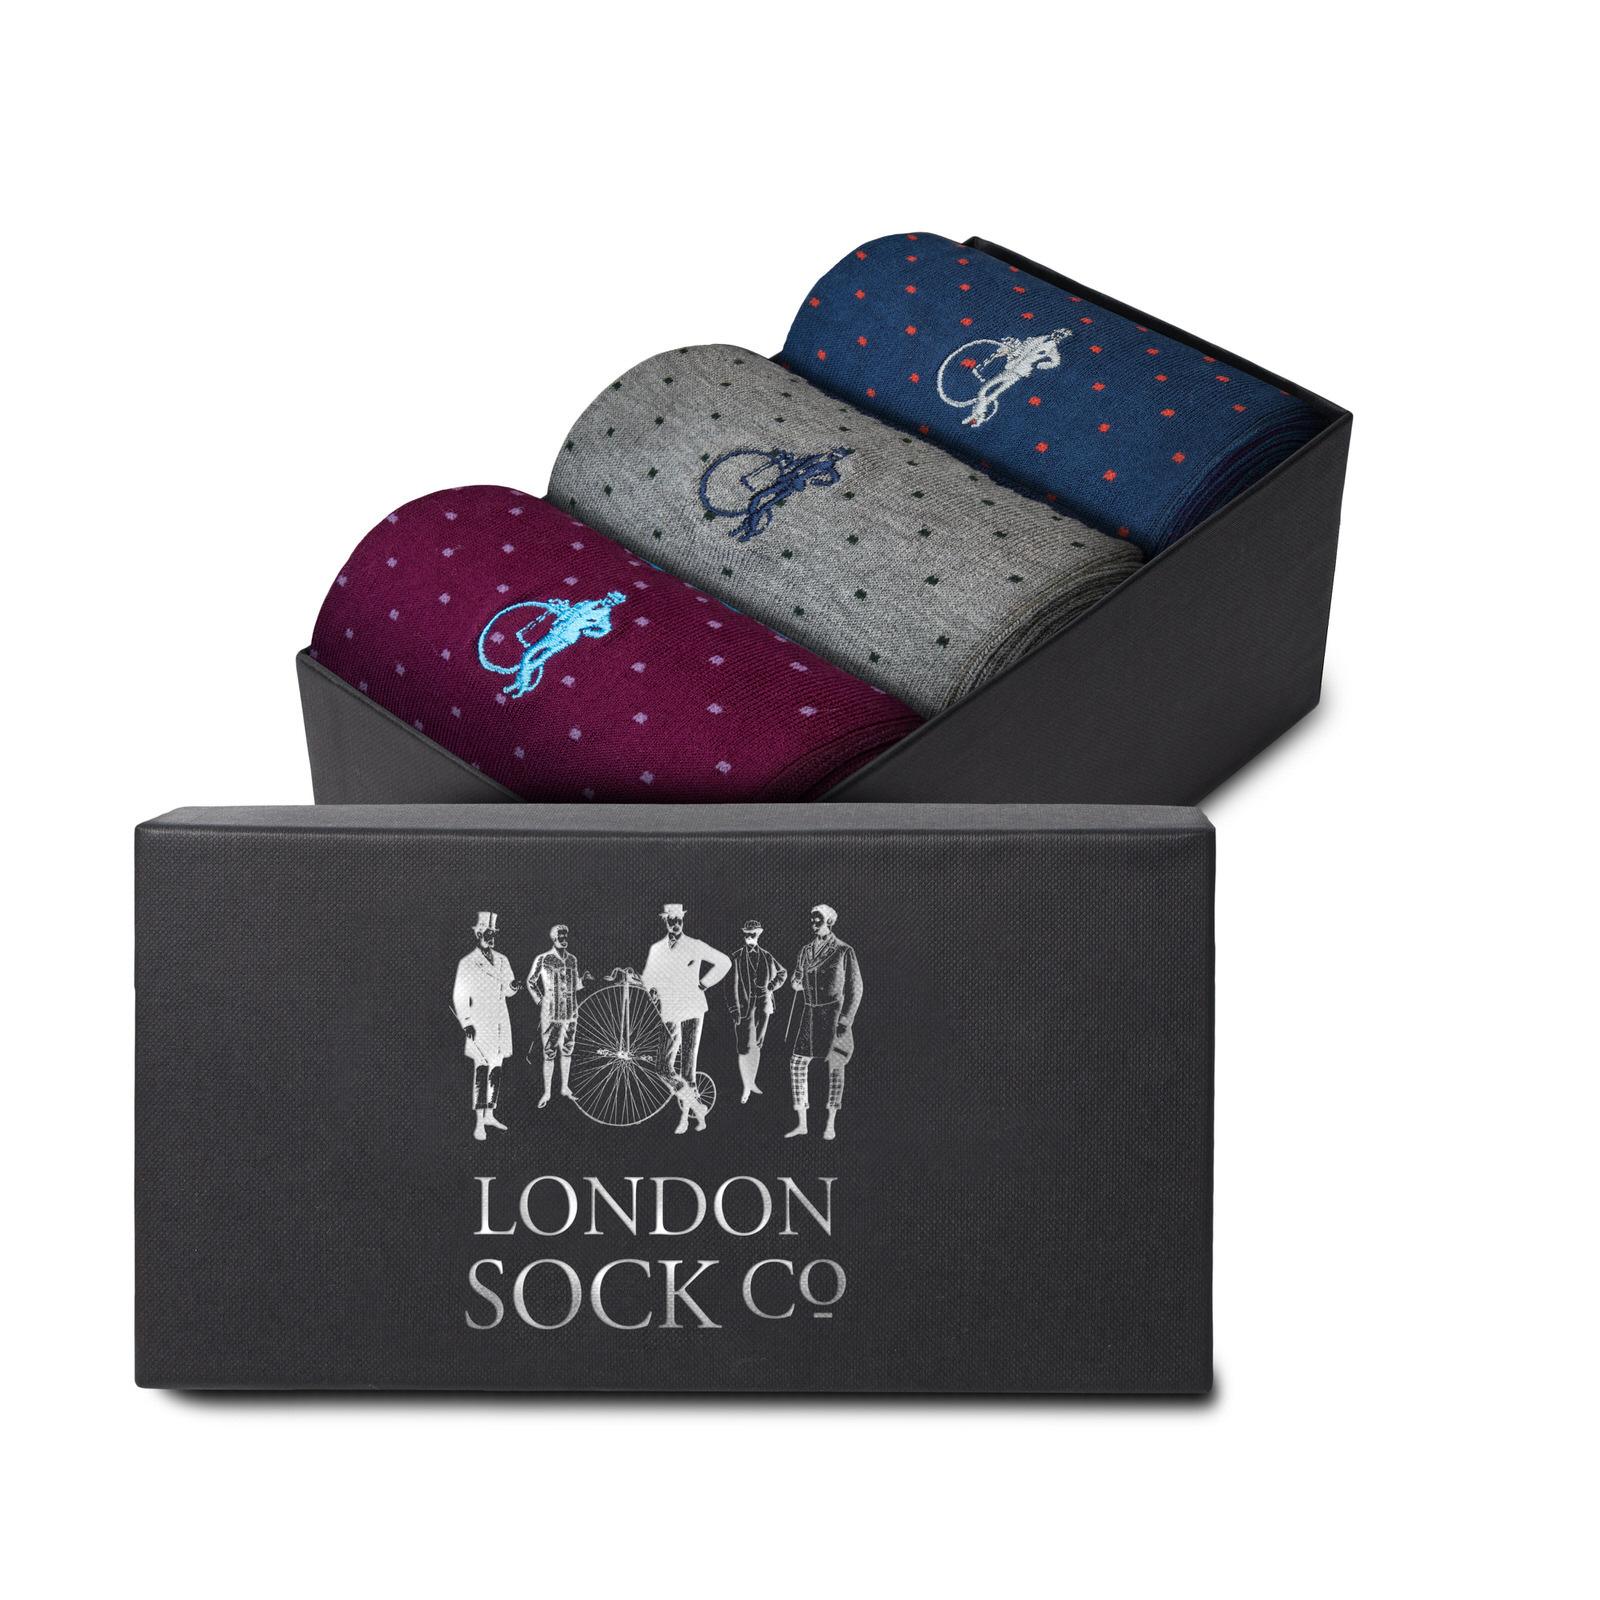 LONDON SOCK COMPANY MARTINA GIFT BOX - 3 PAIR